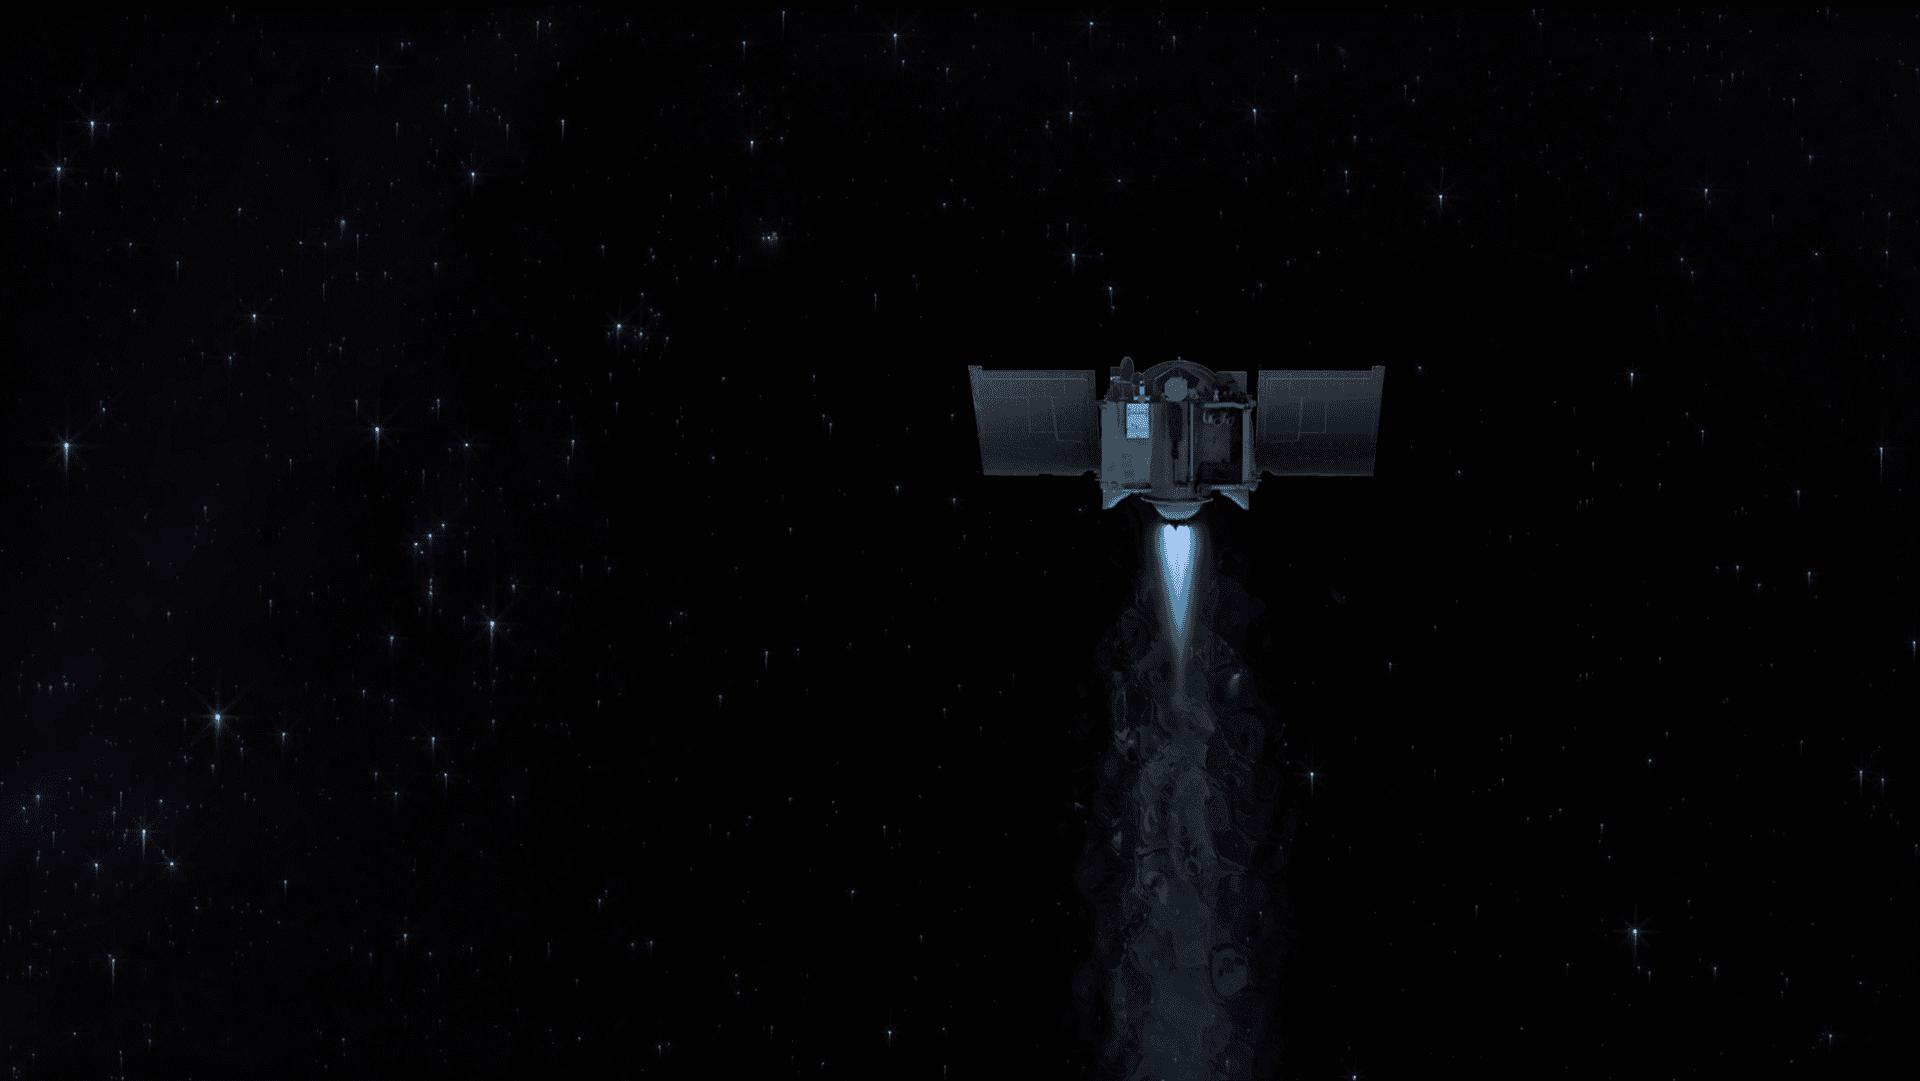 OSIRIS-REx залишив астероїд Бенну